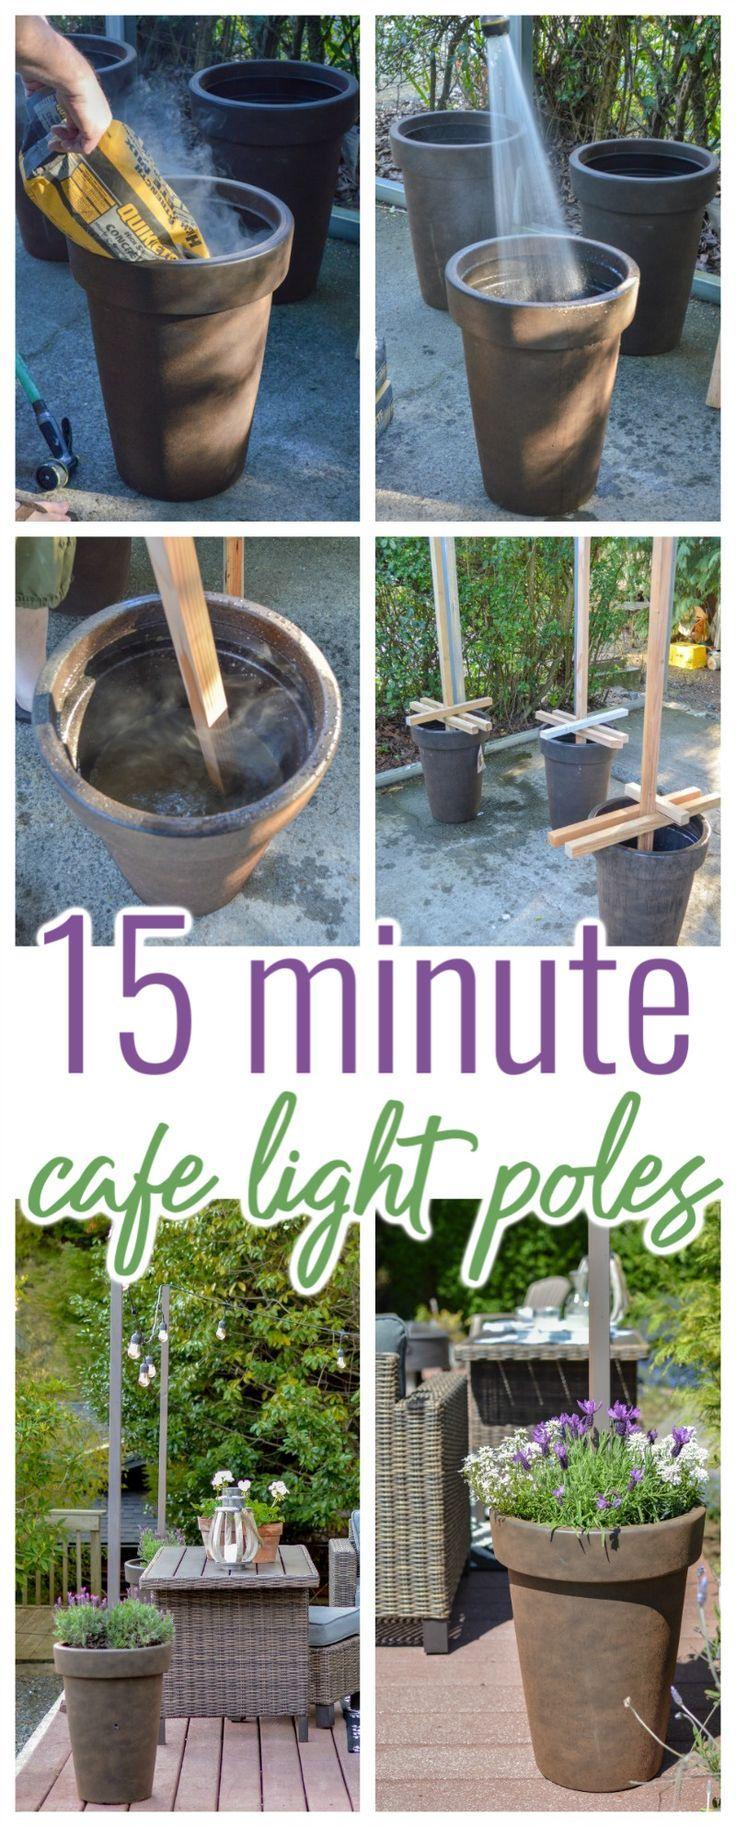 DIY CAFE LIGHT POLE POTS - TAKES ABOUT 15 MINUTES EACH!